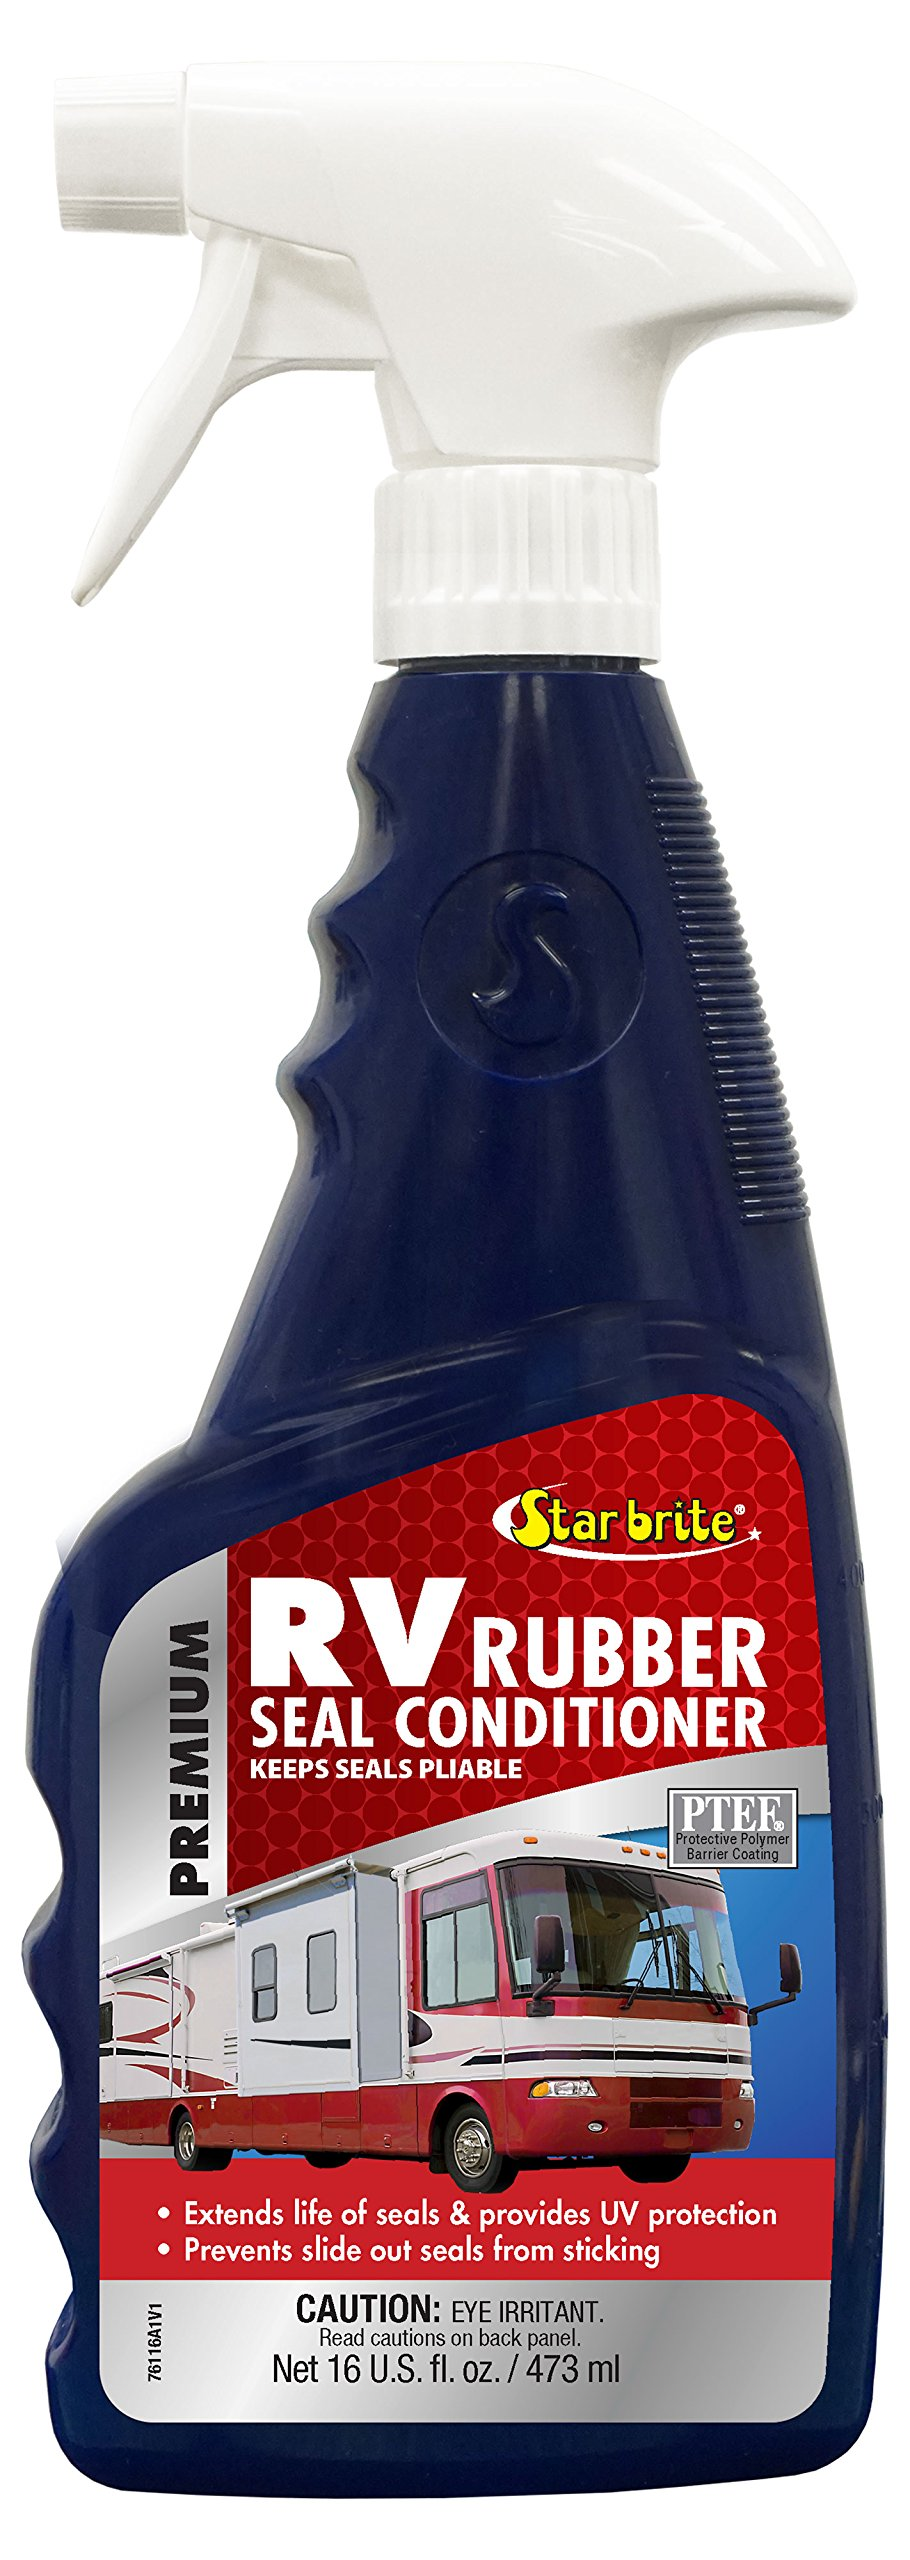 Star Brite Premium Rv Rubber Seal Conditioner Protectant